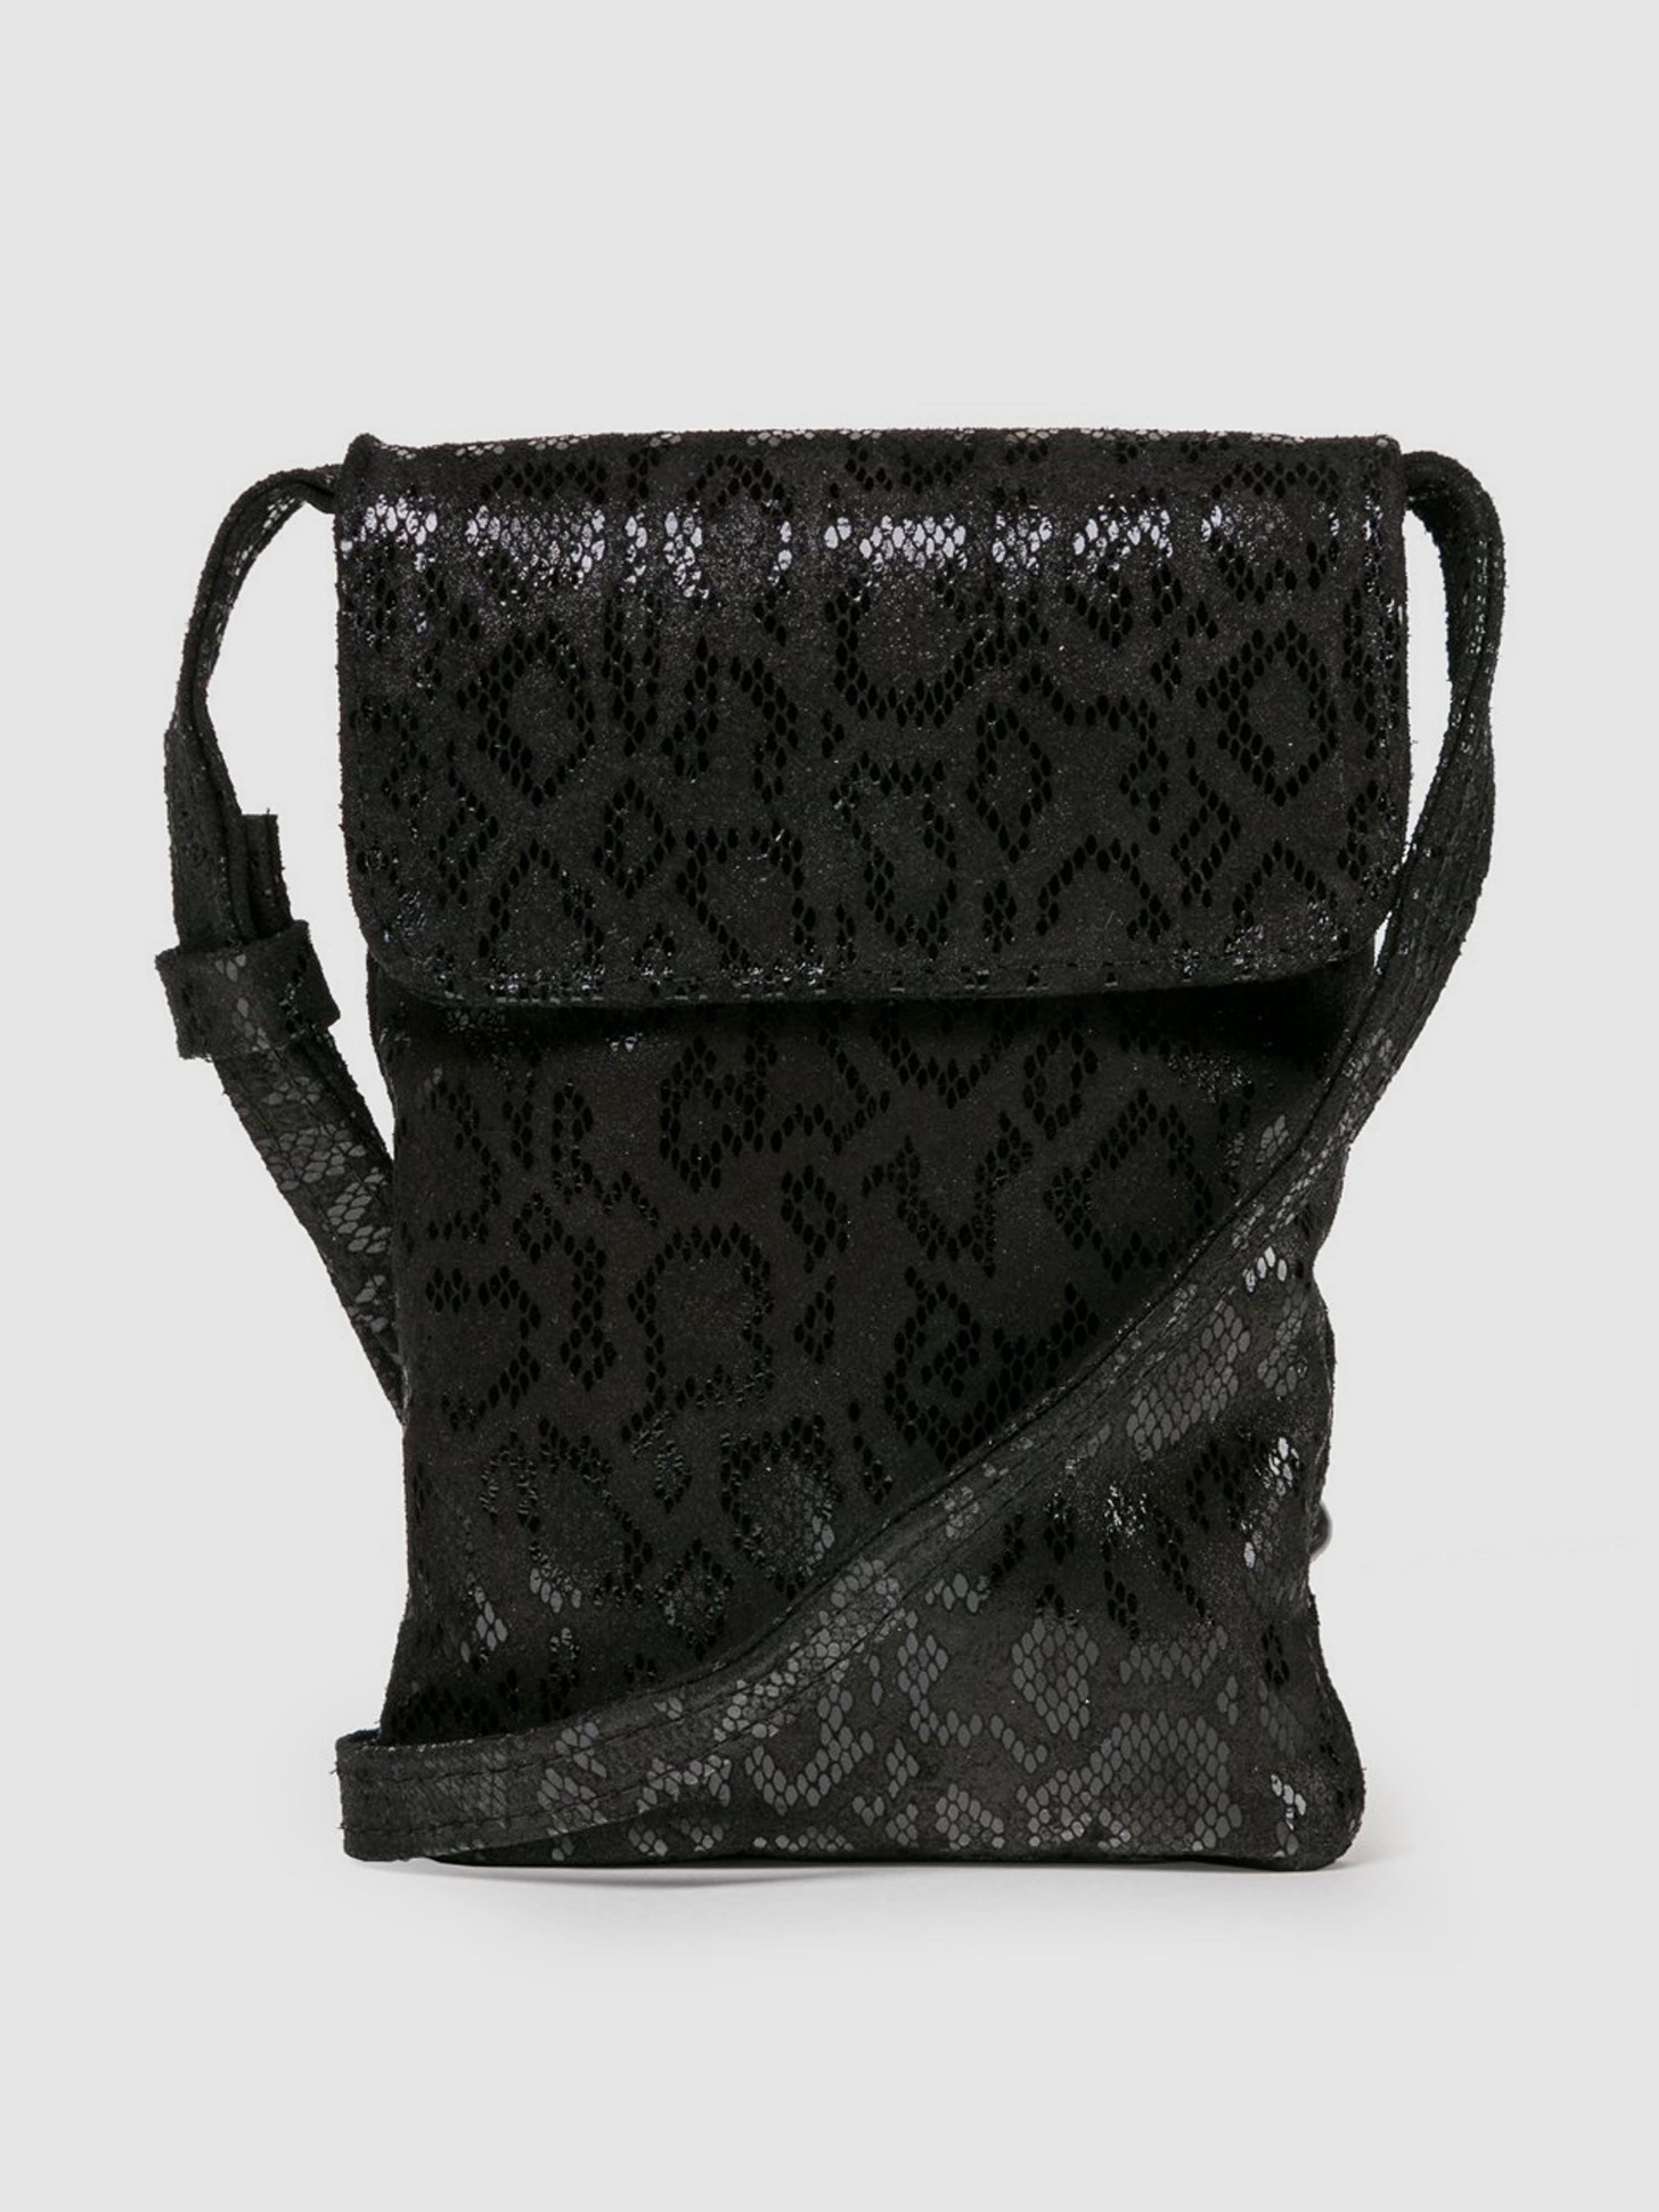 CoFi Leathers Penny Phone Bag: Black Anaconda  - Black